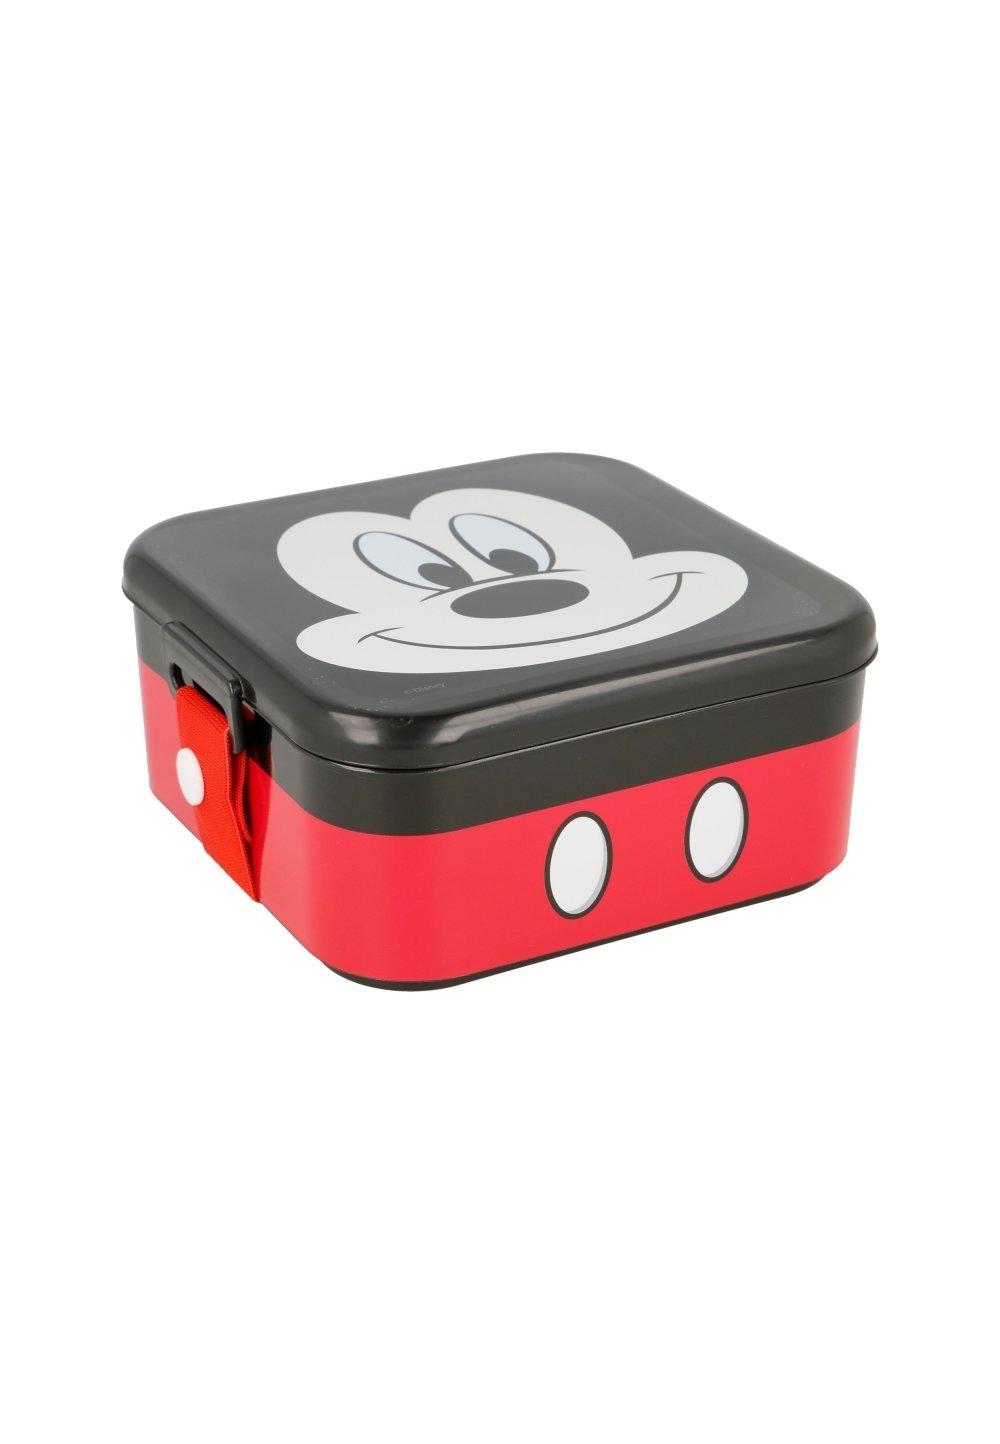 Cutie alimentara, rosie, Mickey Mouse imagine